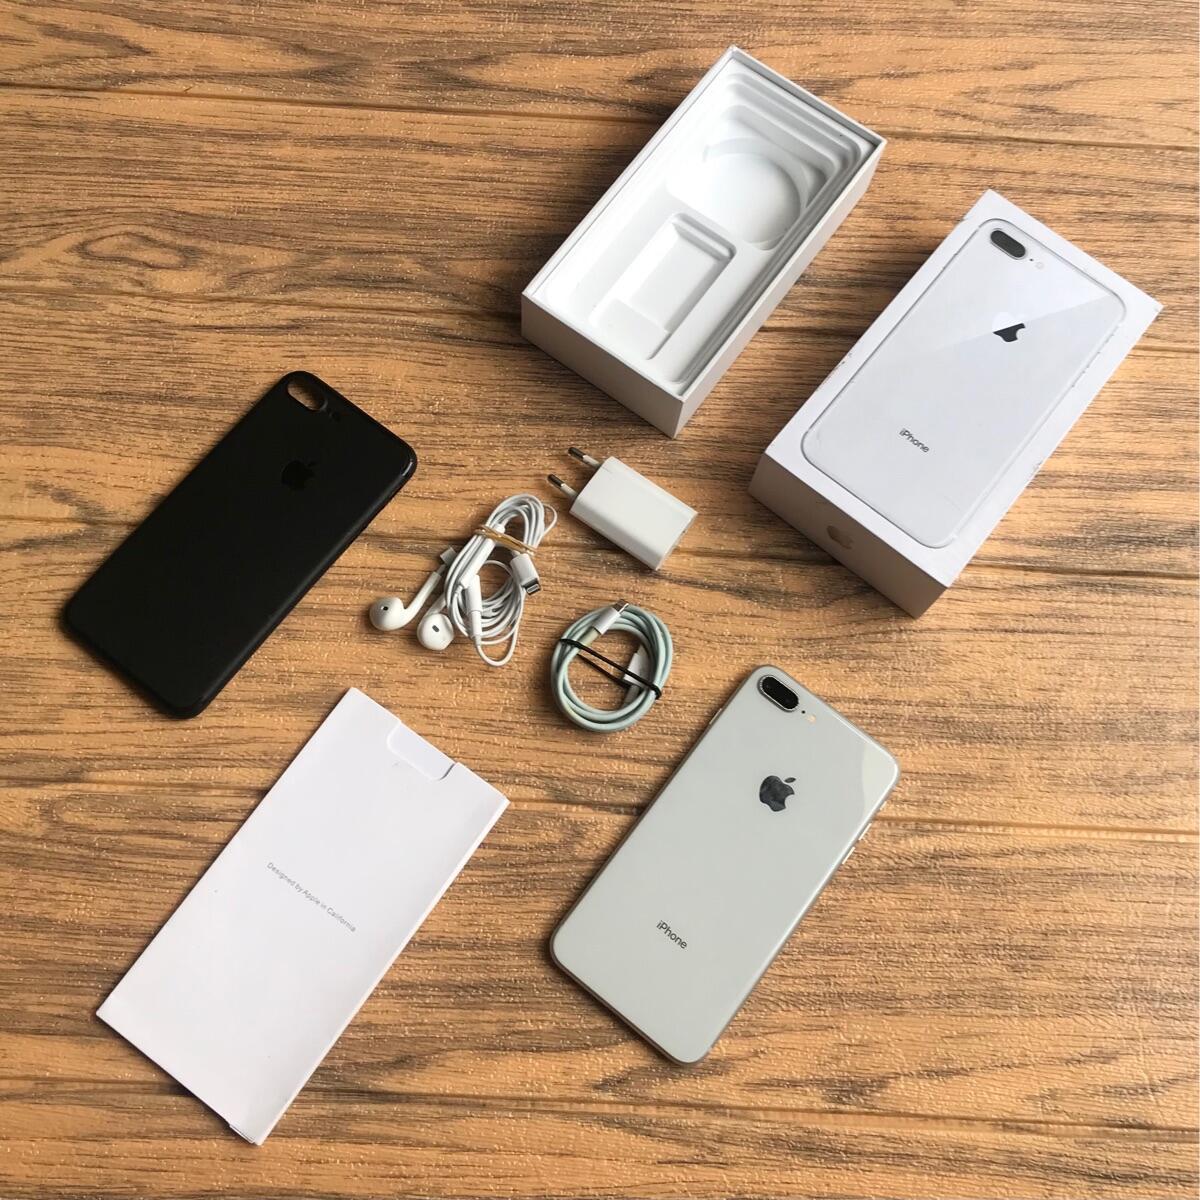 Terjual iphone 8 plus 64gb silver fullset ex ibox PA/A ...